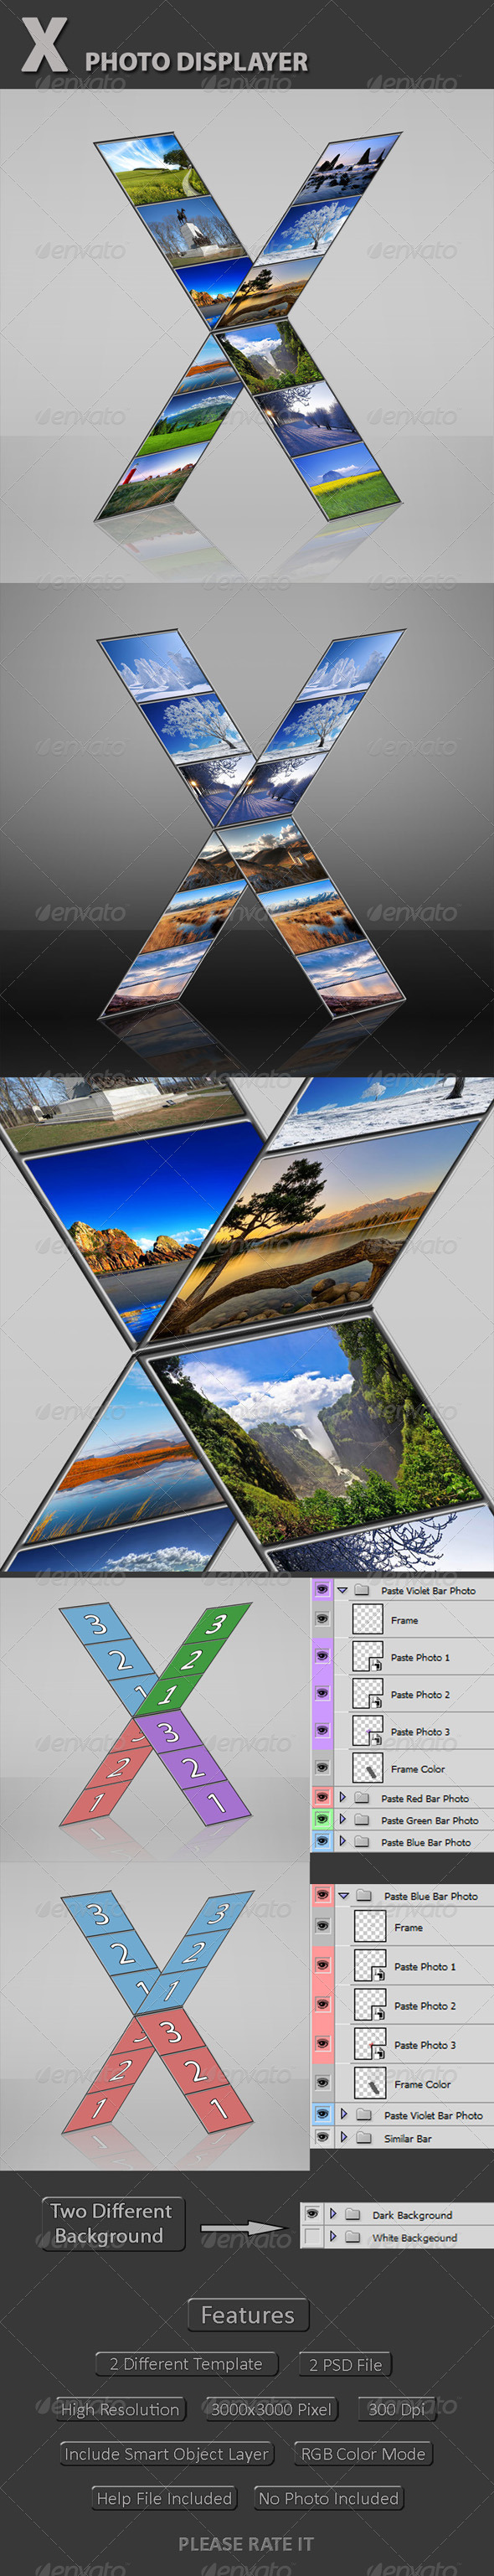 GraphicRiver X Photo Displayer 5085841